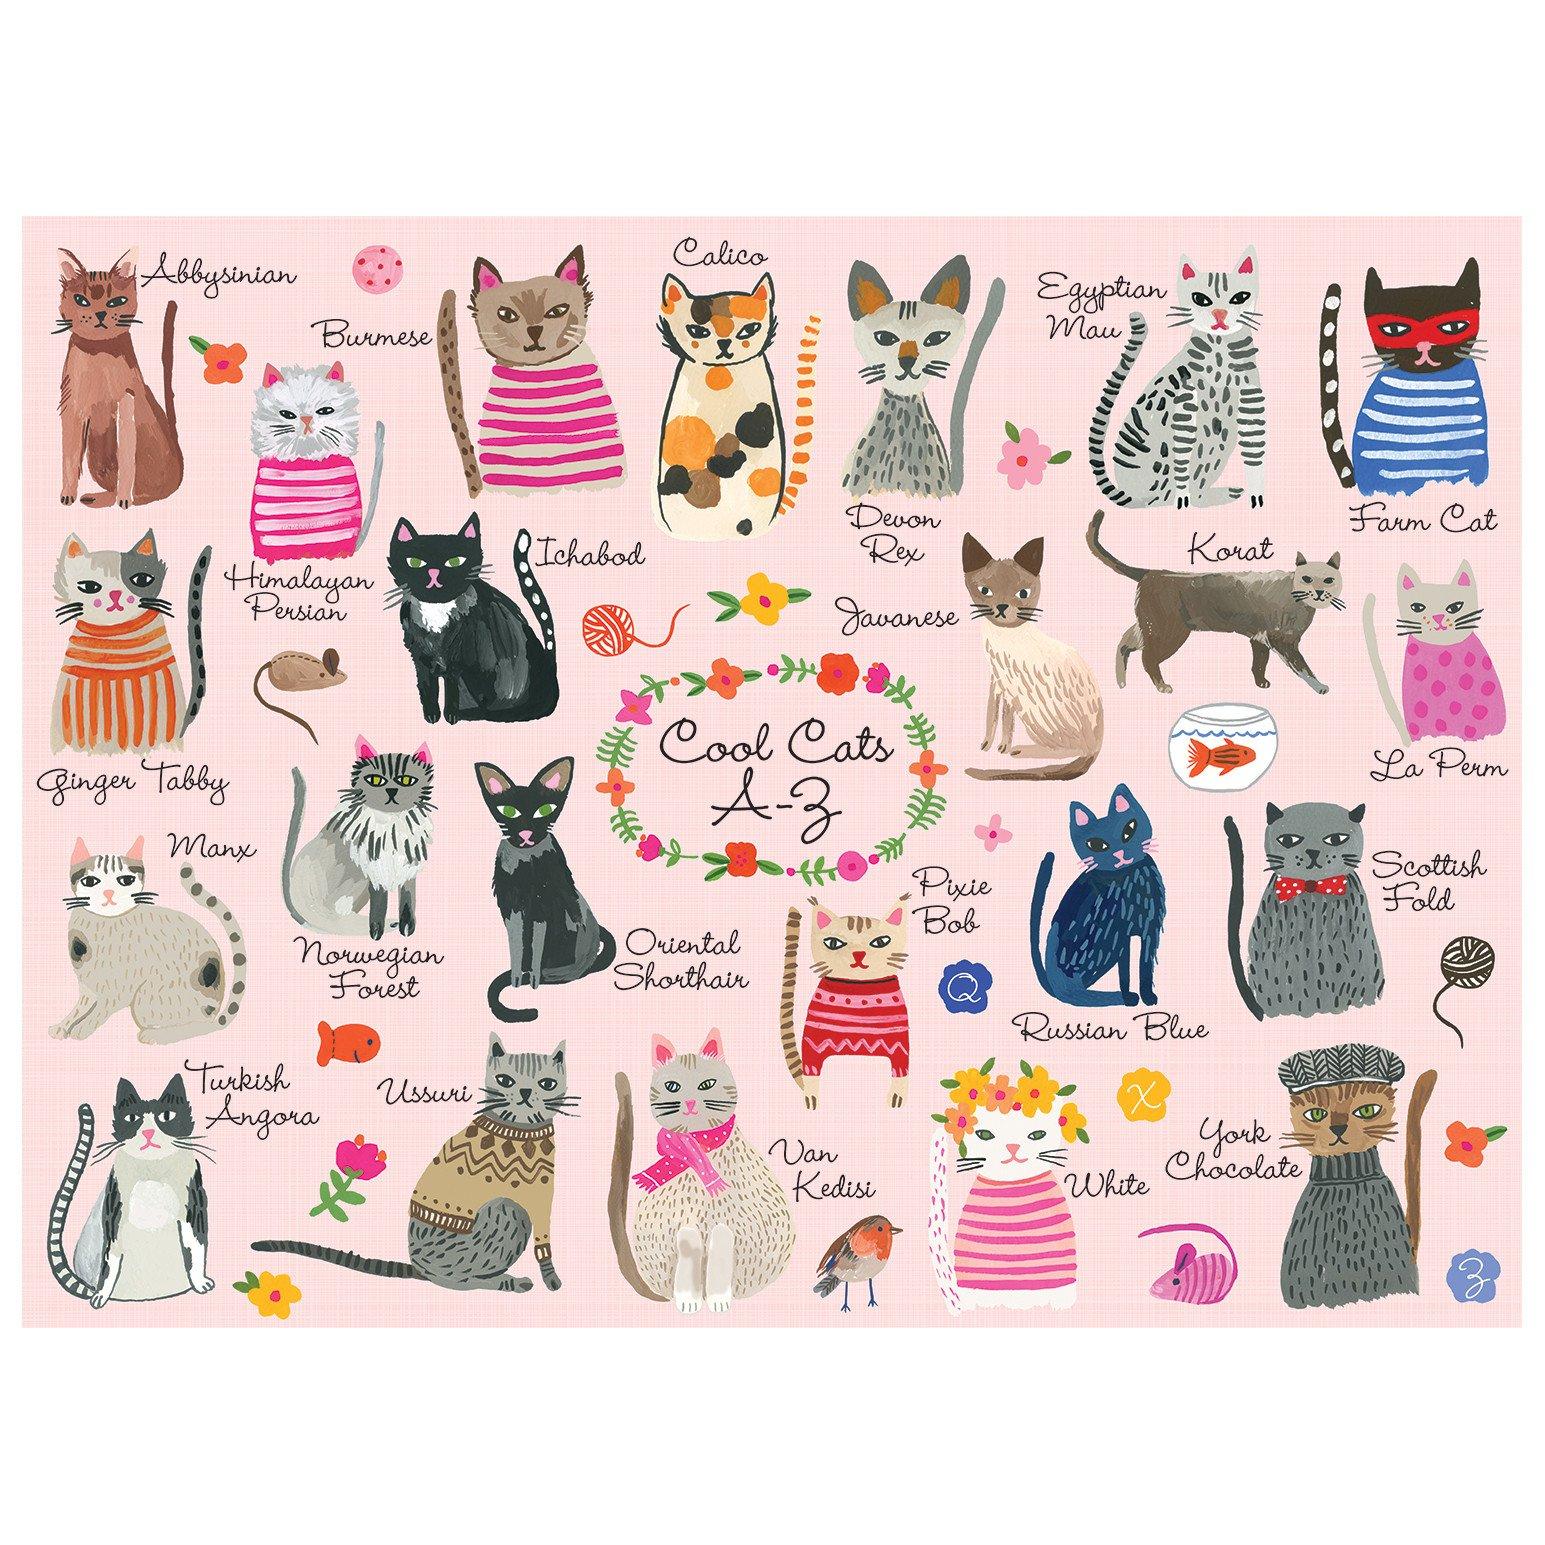 Galison Puzzle-Cool Cats A-Z 1000 Piece